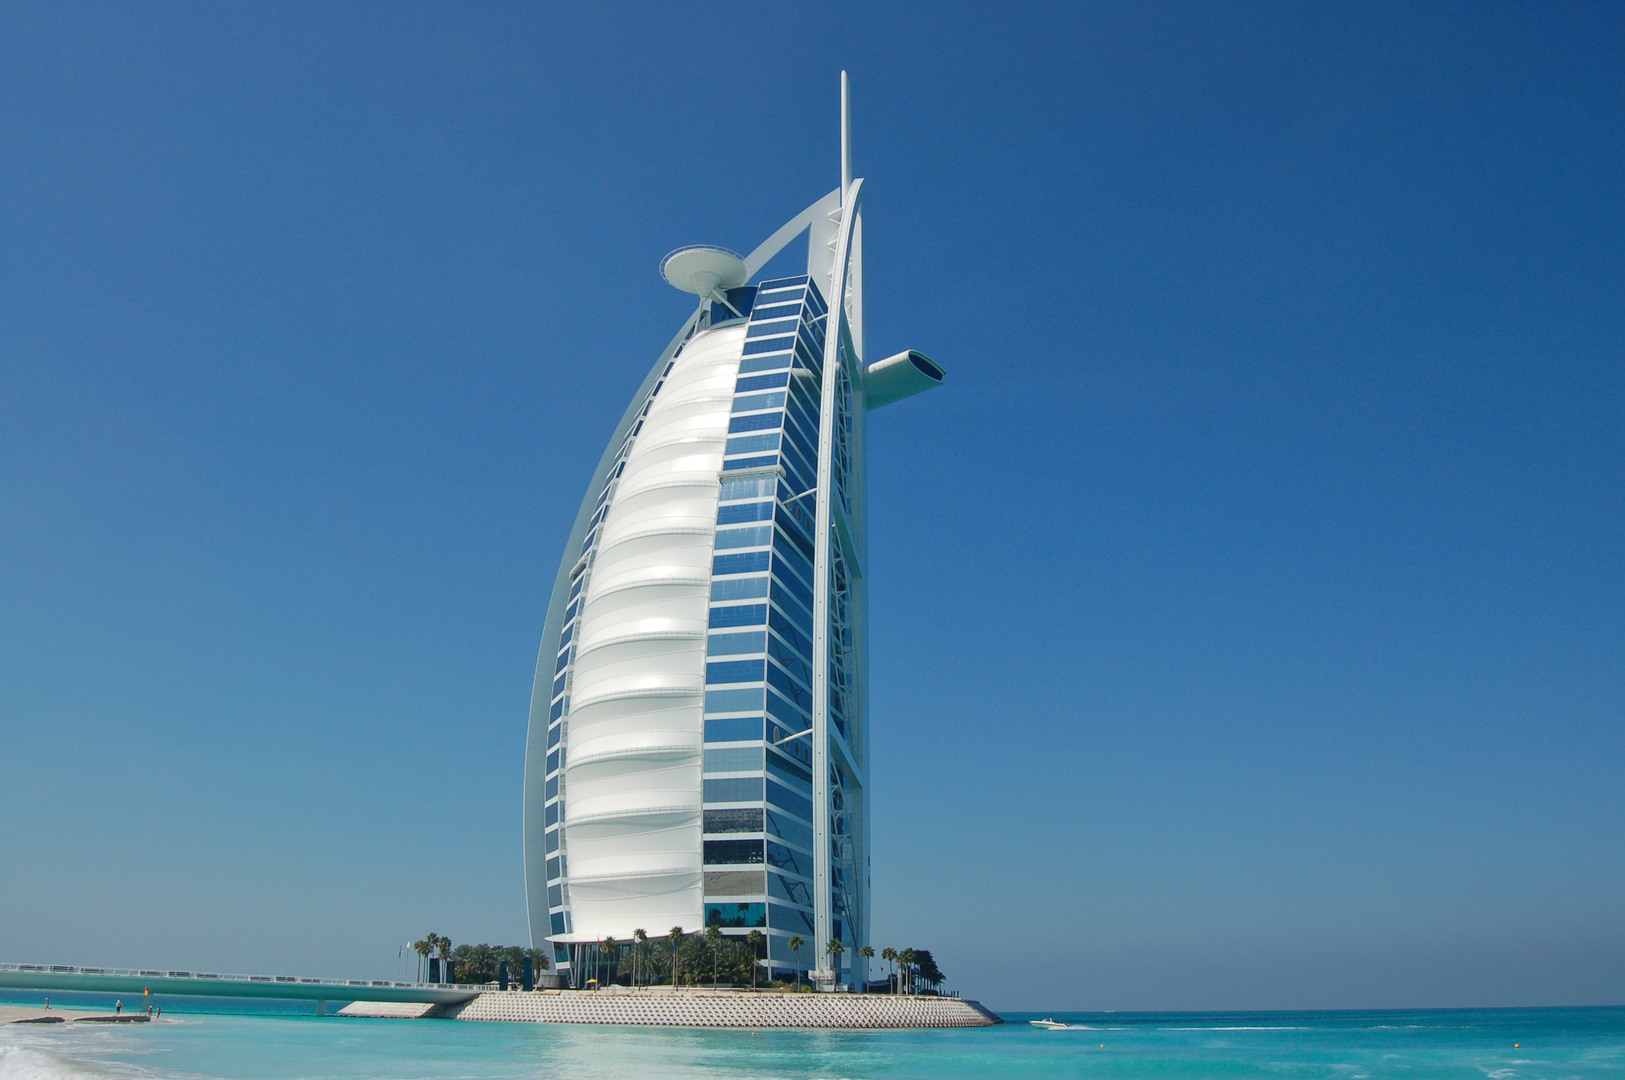 Dubaj platila za extrémně drahou destinaci, to už dnes ale neplatí.